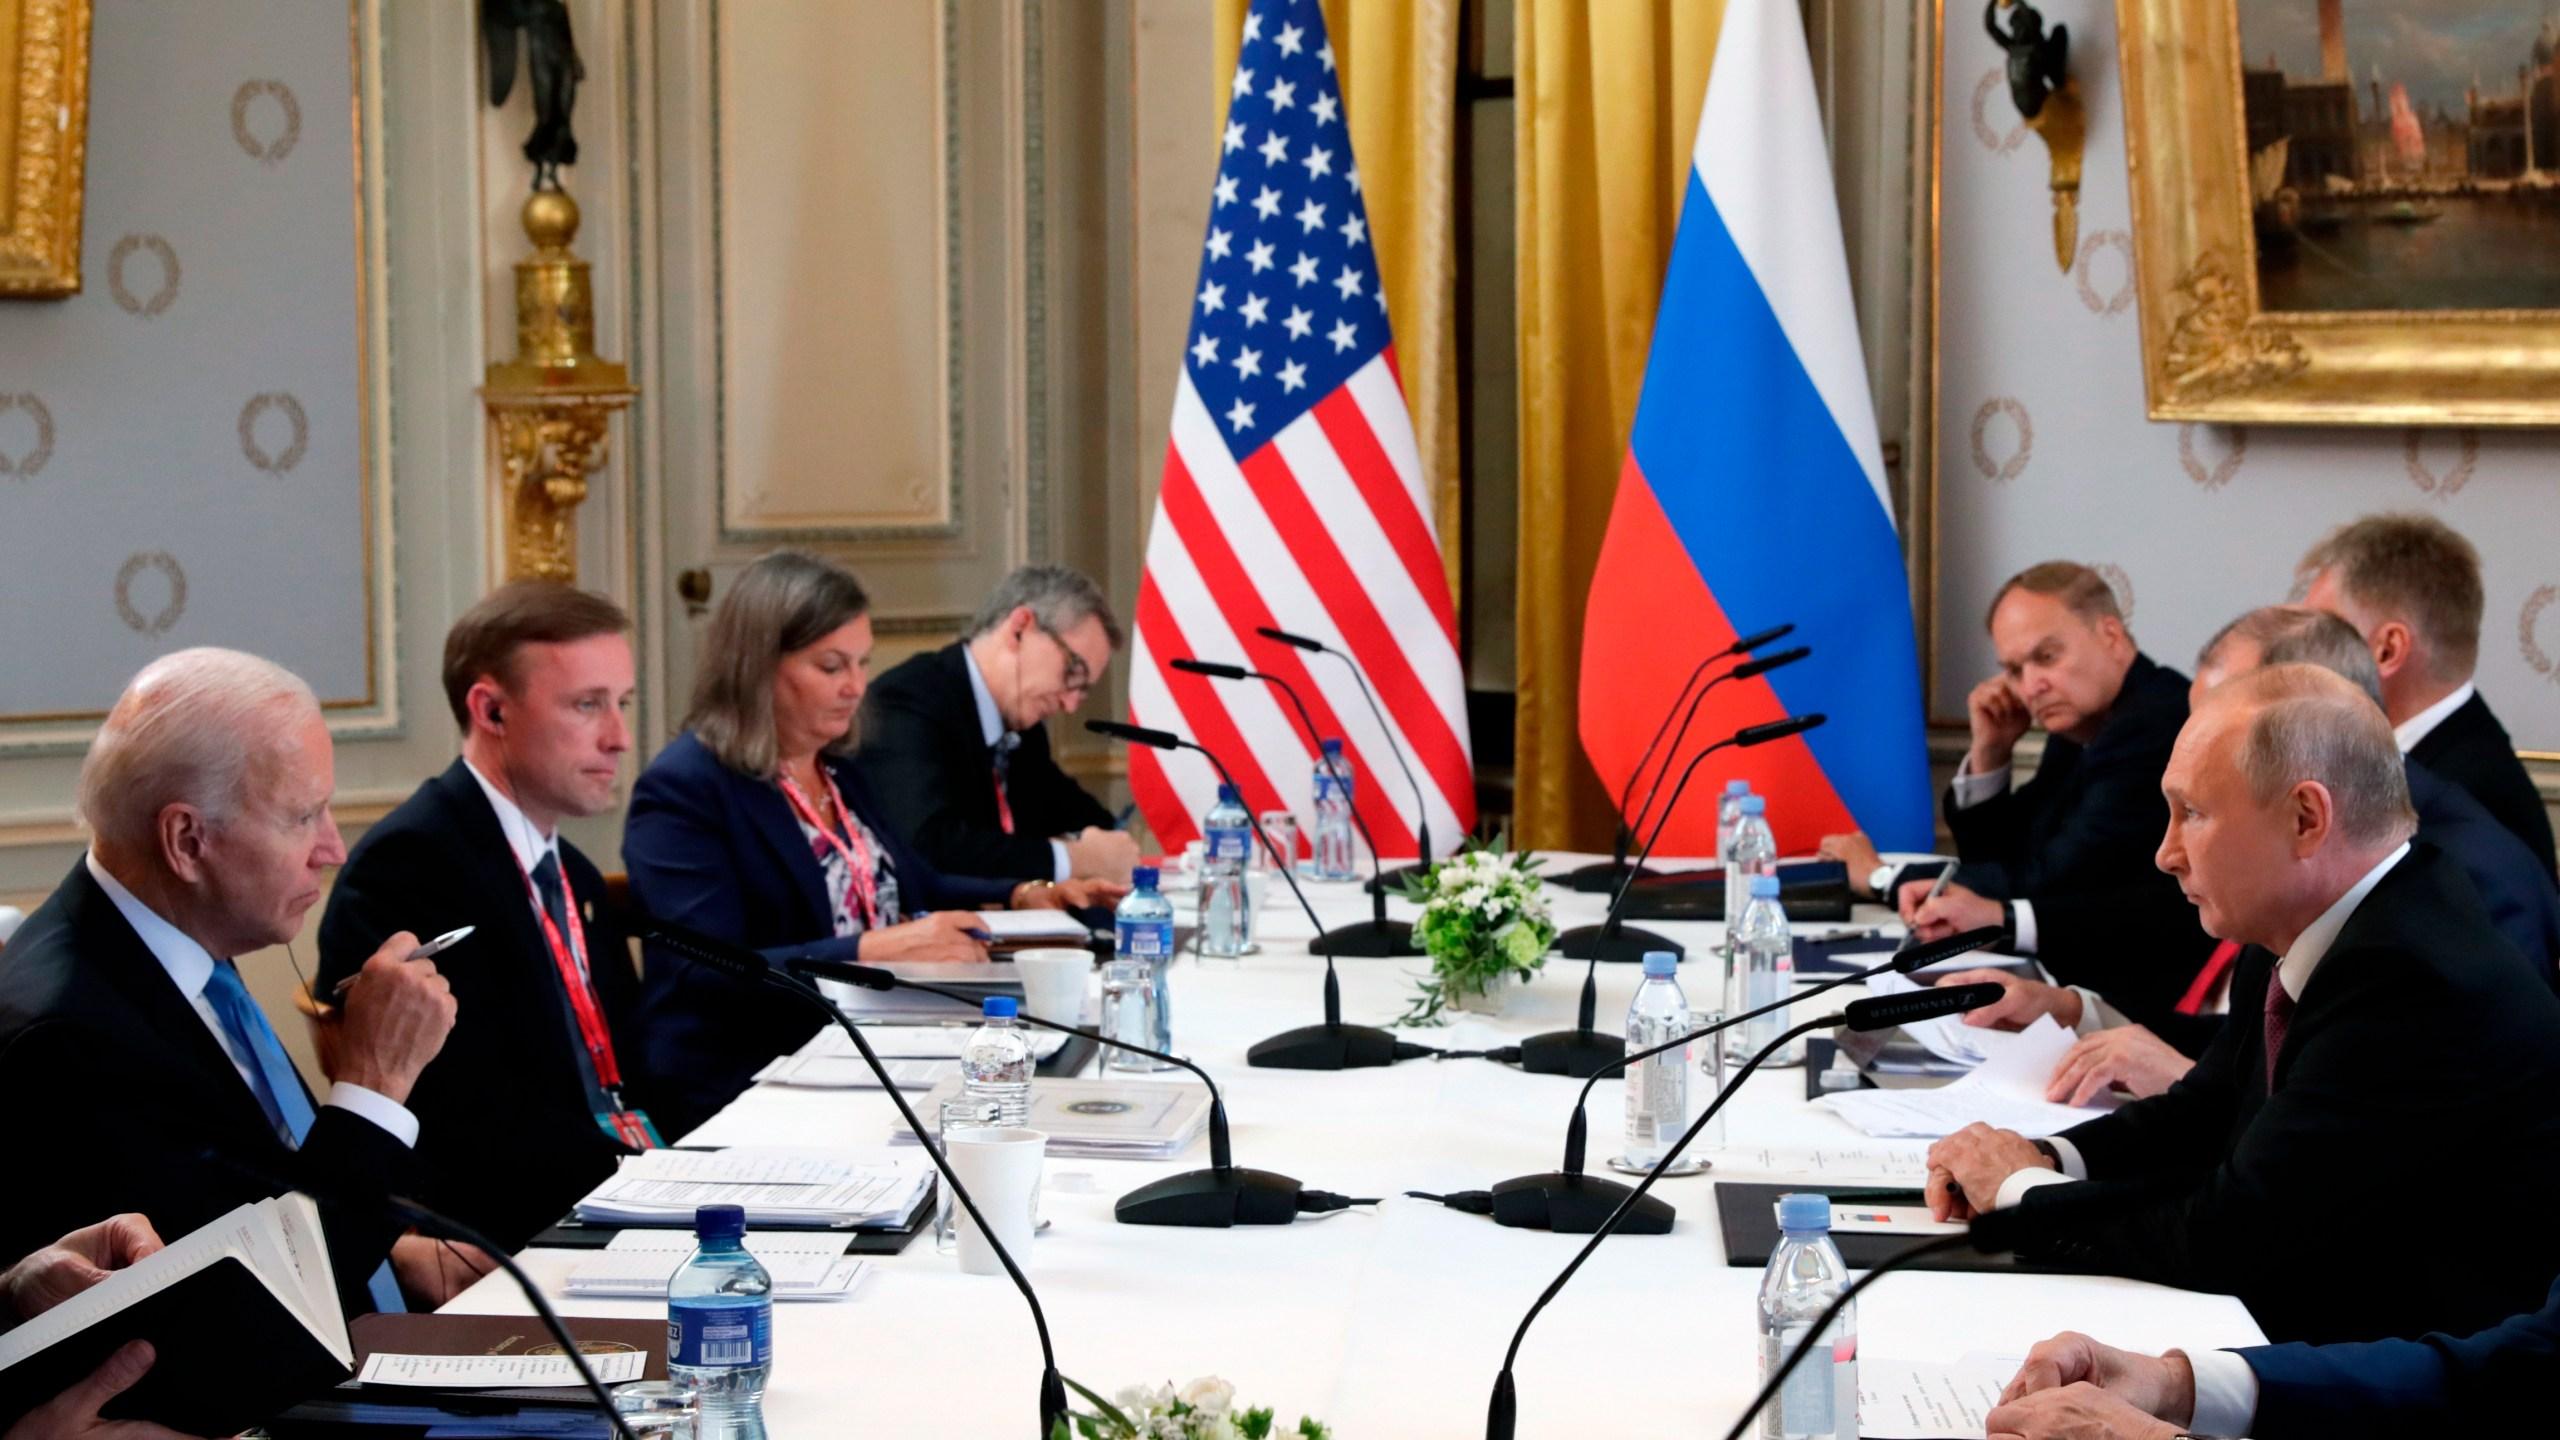 Takeaways from Biden-Putin summit: Skepticism, respect    ConchoValleyHomepage.com